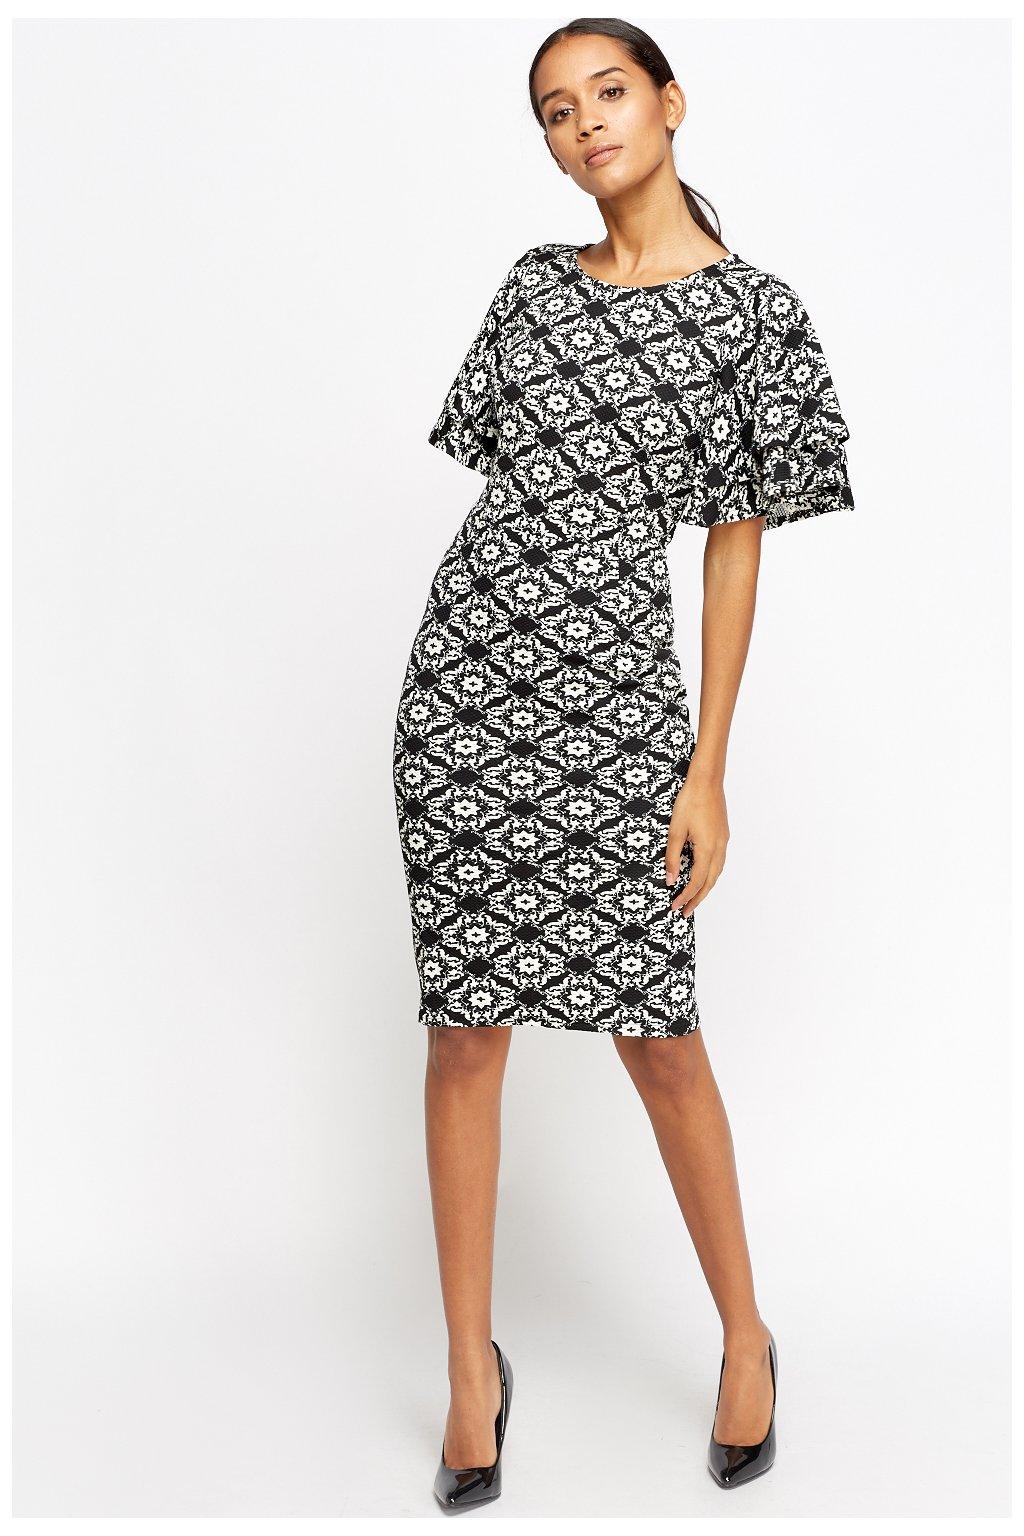 flare sleeves textured midi dress black white 45510 5